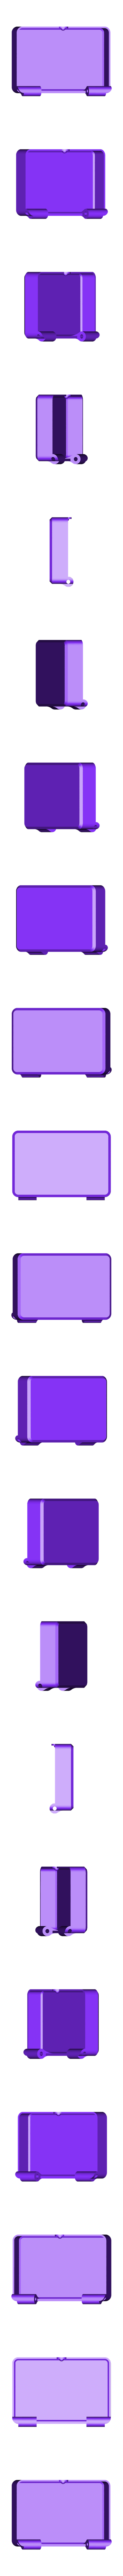 LR44_AG13_case_2.stl Download free STL file CR2032, LR44, AG13 Coin Battery Case • 3D printable object, parkgwansu339